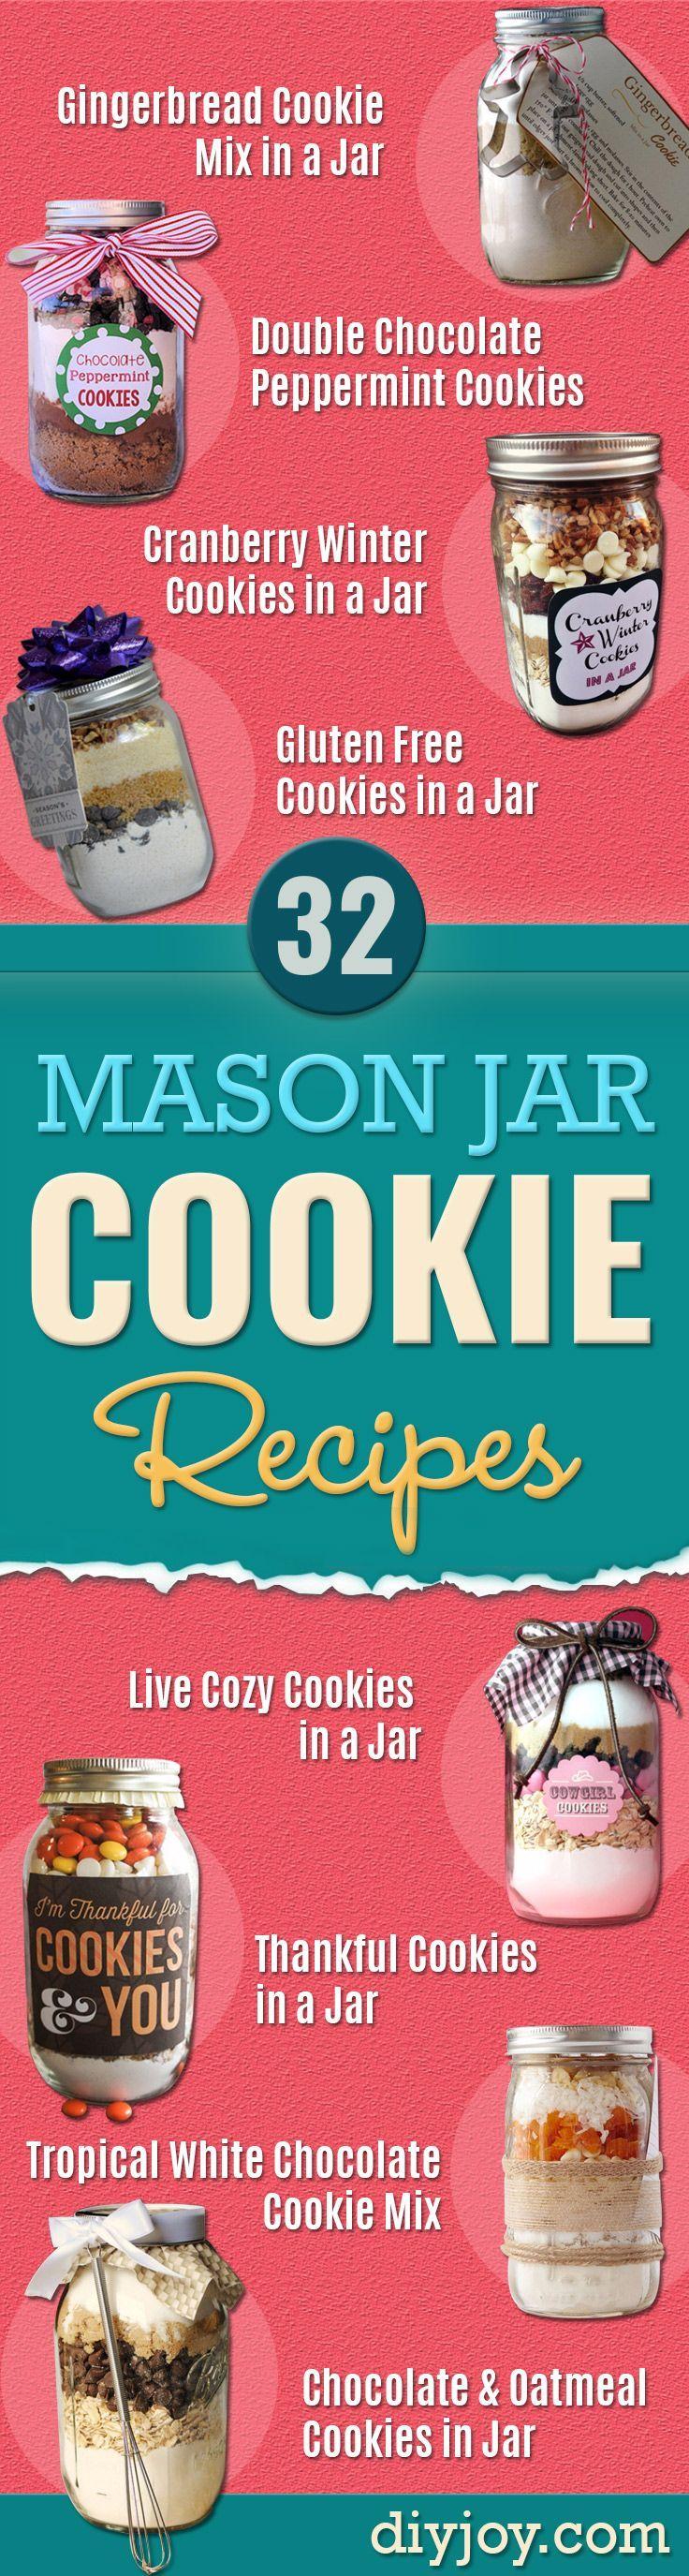 best mason jar cookie recipes ever created mason jar cookie